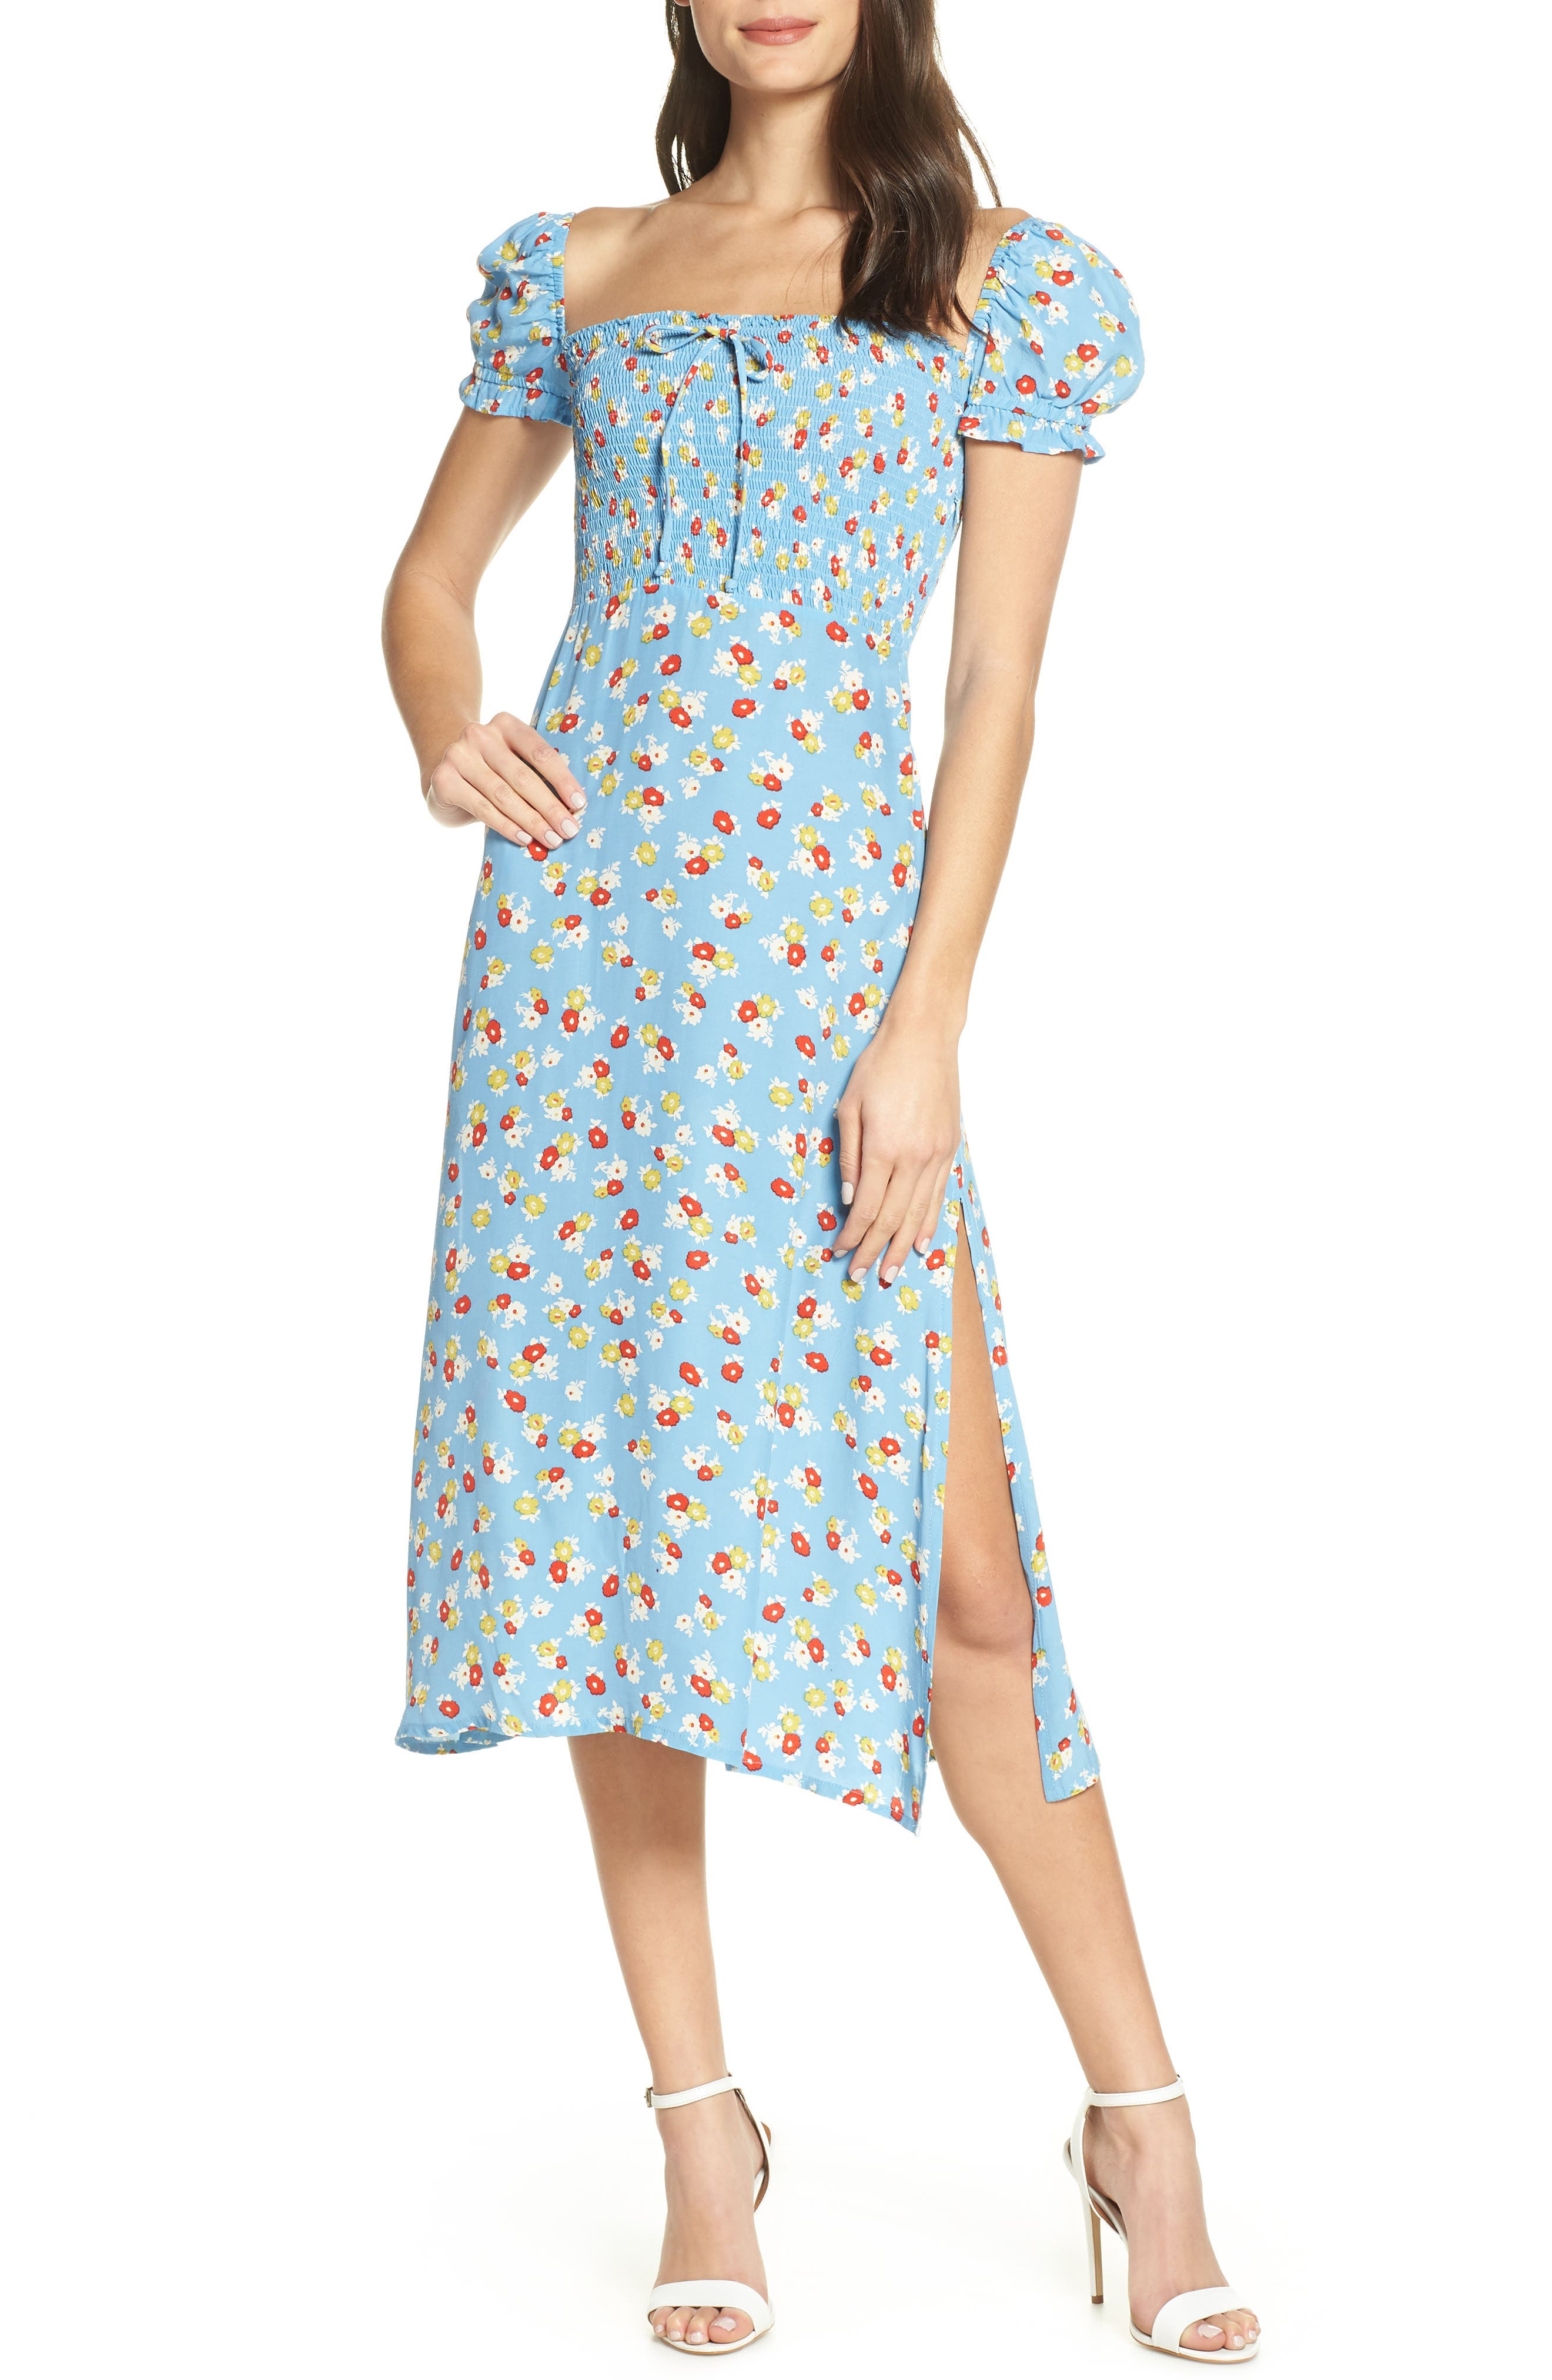 FAITHFULL THE BRAND, Castilo Jasmin Midi Dress, Main thumbnail 1, color, JASMIN FLORAL PRINT - BLUE